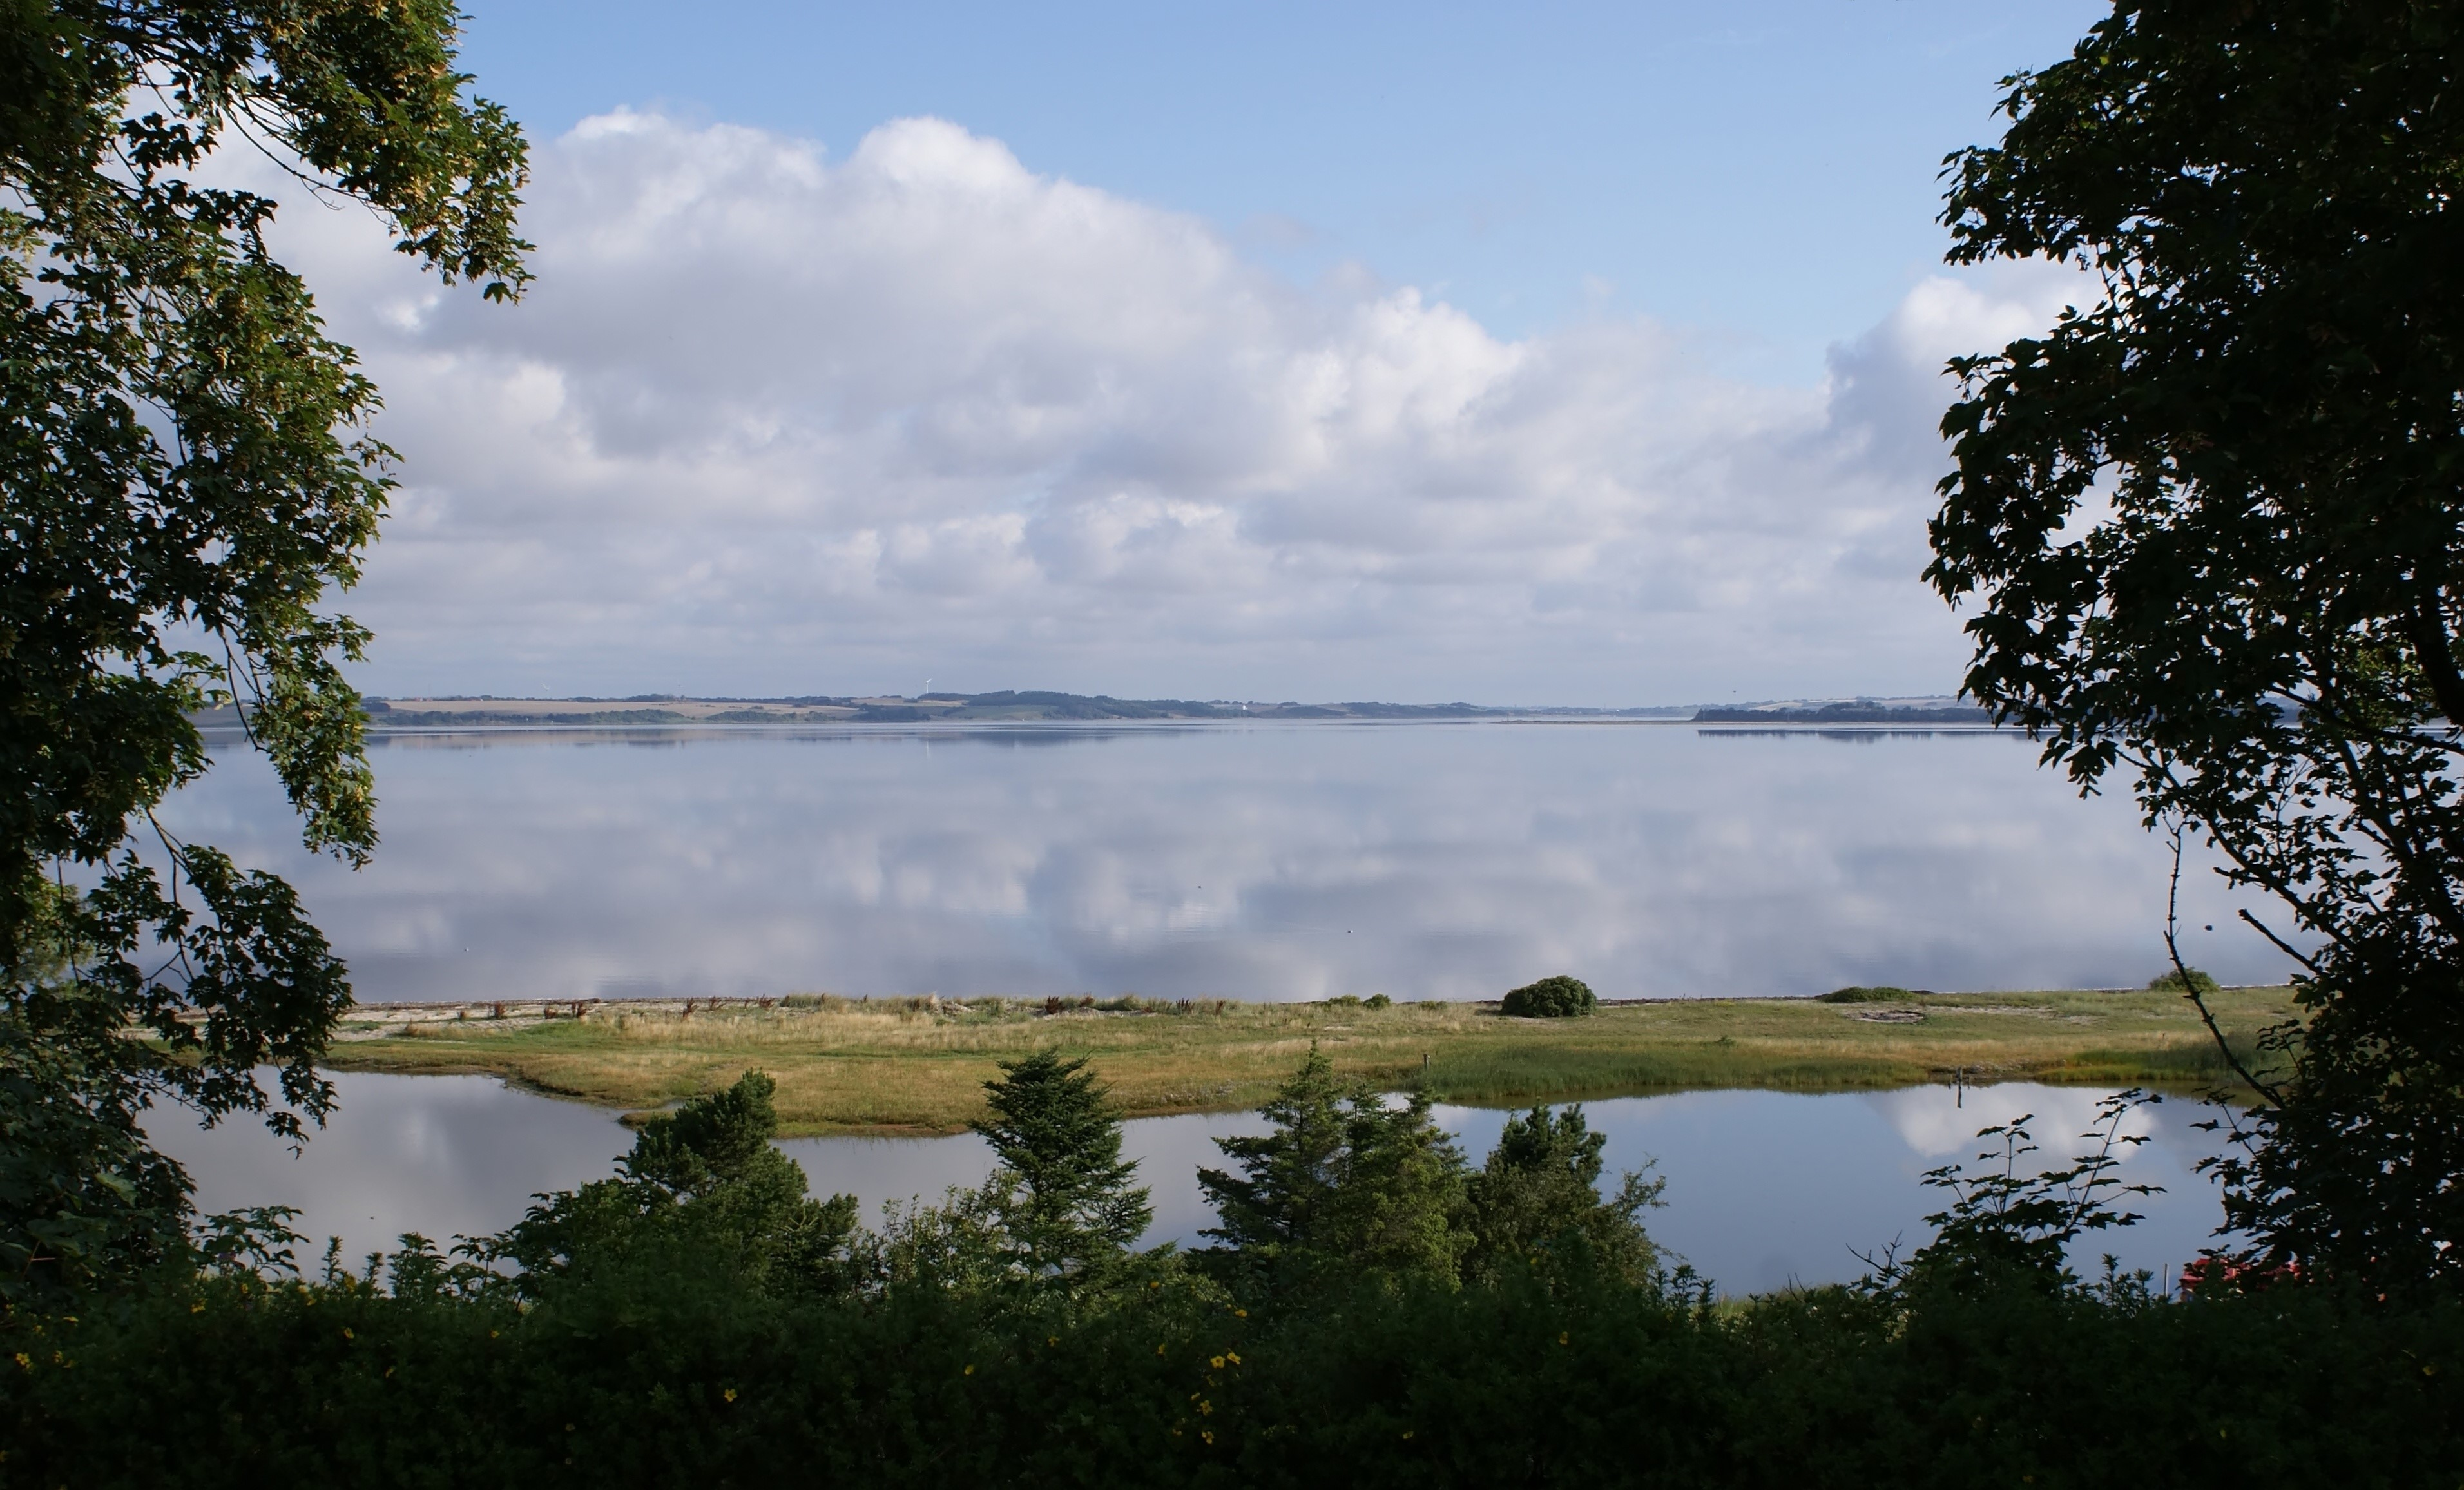 Ny rapport: Udbredt iltsvind i fjordene